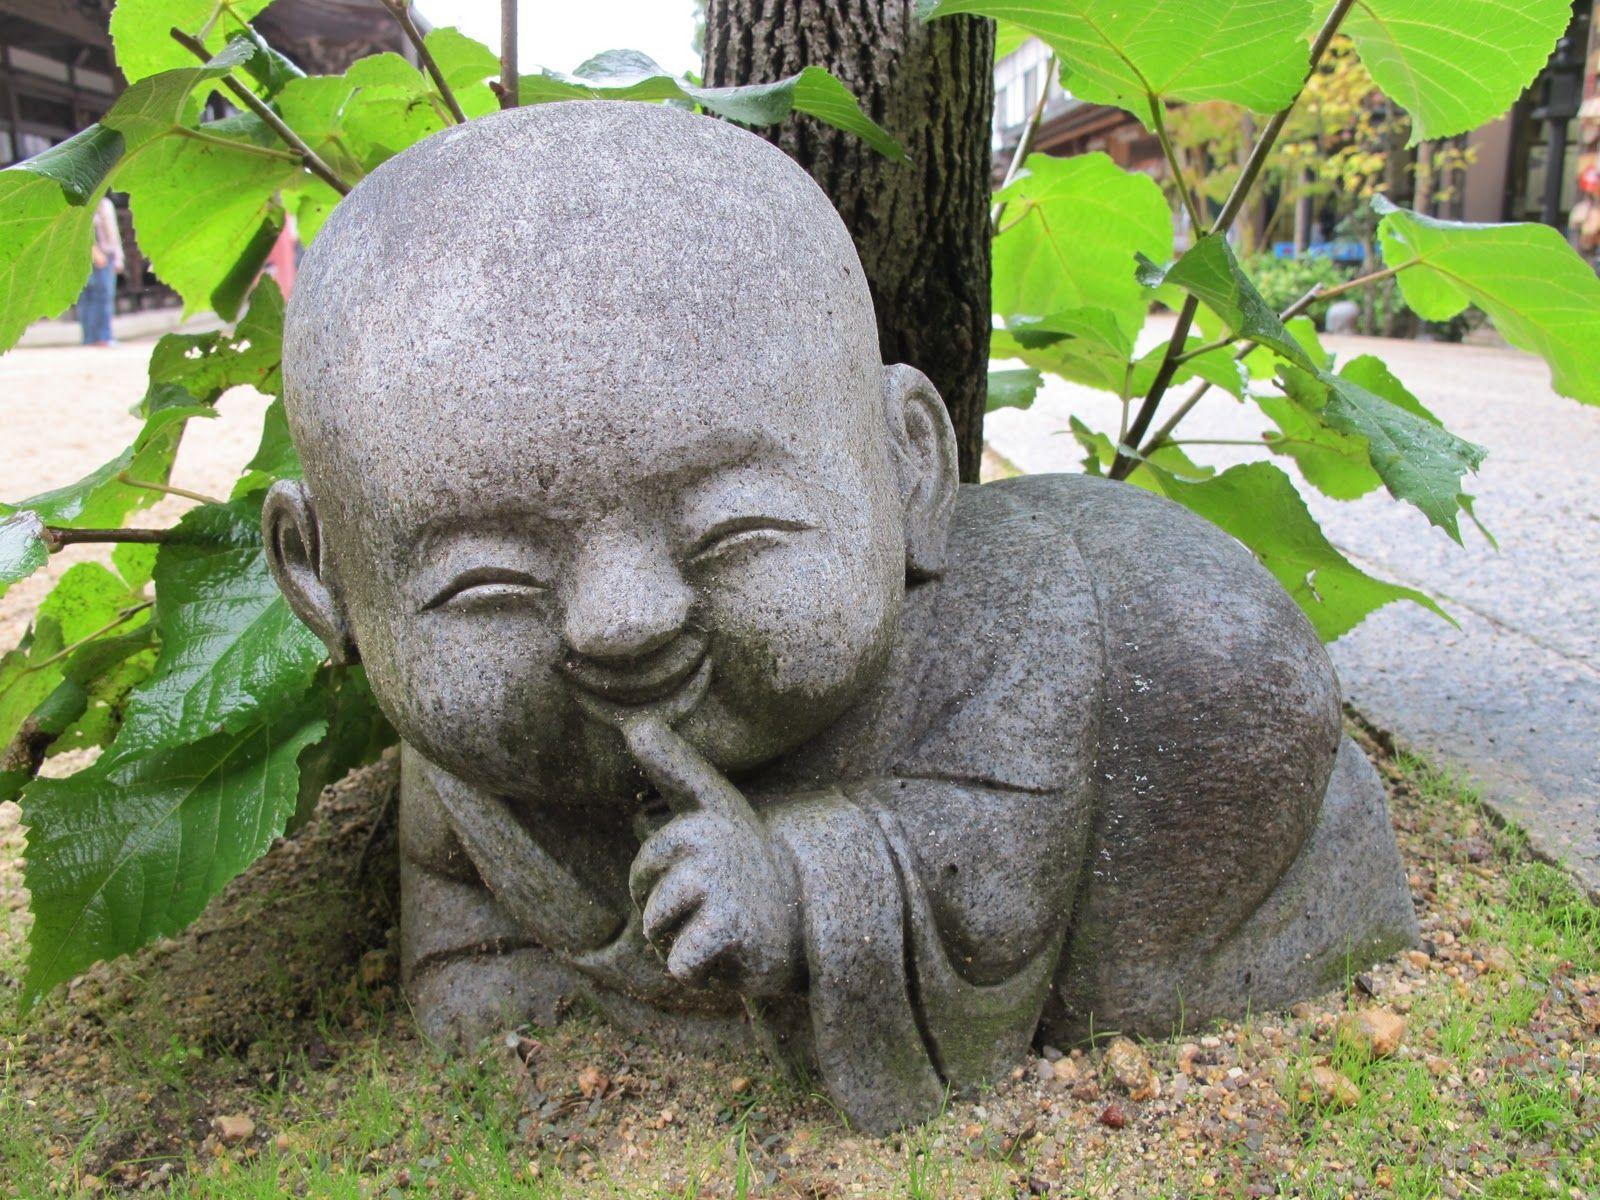 Bbbb Jpg 1600 1200 Buddha Garden Buddha Zen Zen Garden